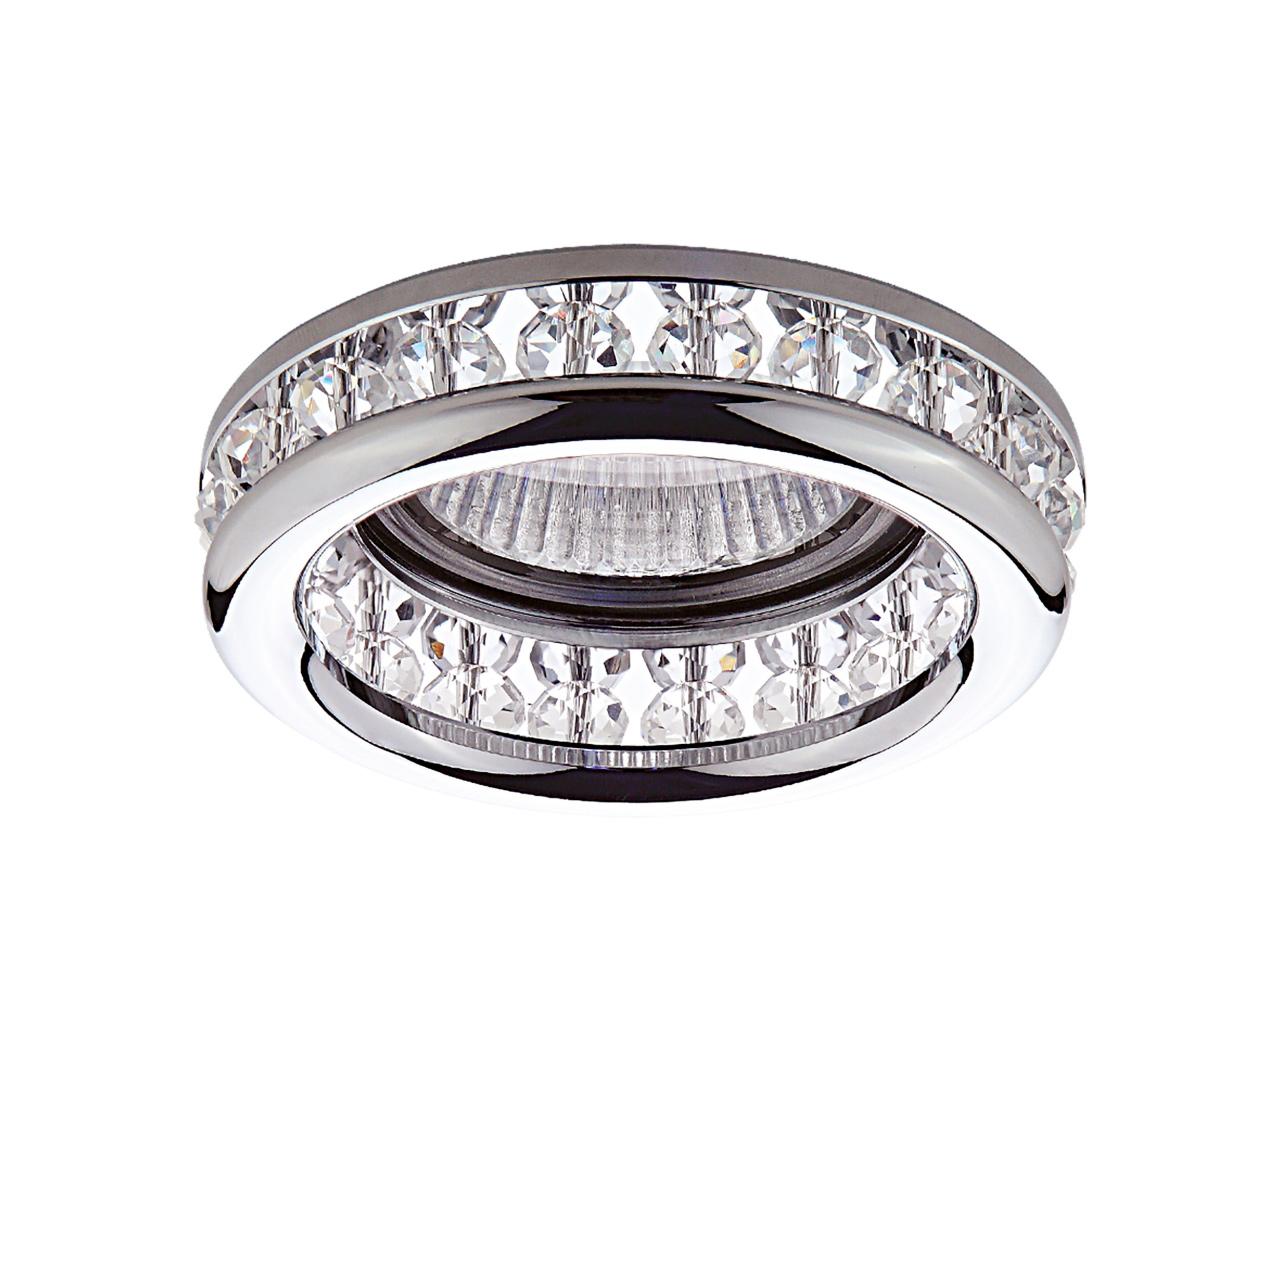 Светильник Monilo INC MR16 / HP16 хром / прозрачный Lightstar 031704